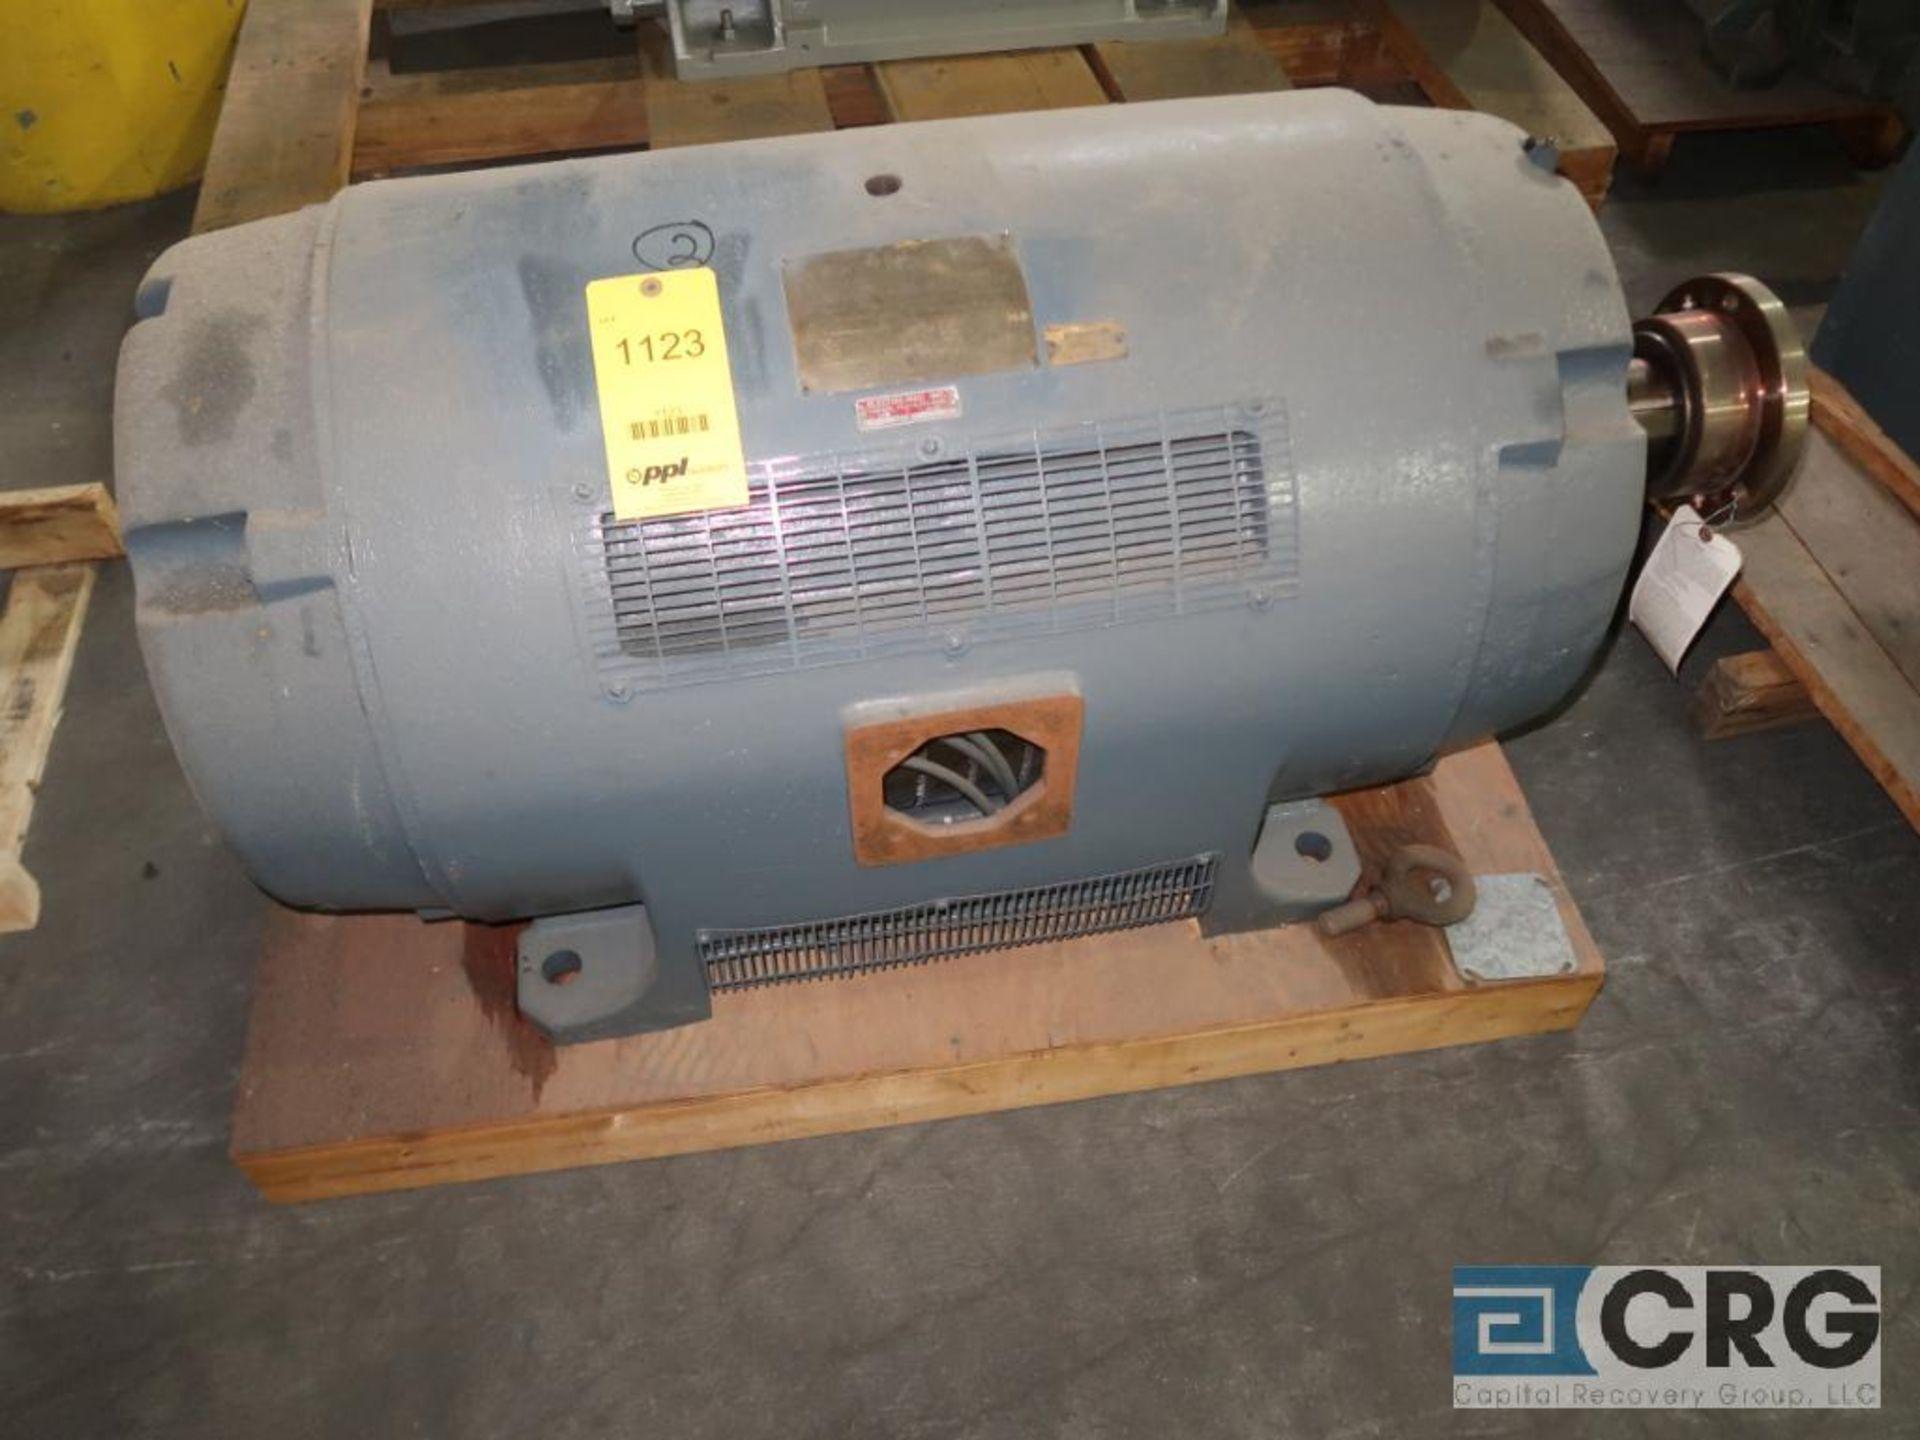 Siemens-Allis induction motor, 300 HP, 1,180 RPMs, 2,300 volt, 3 ph., 449T frame (Finish Building)